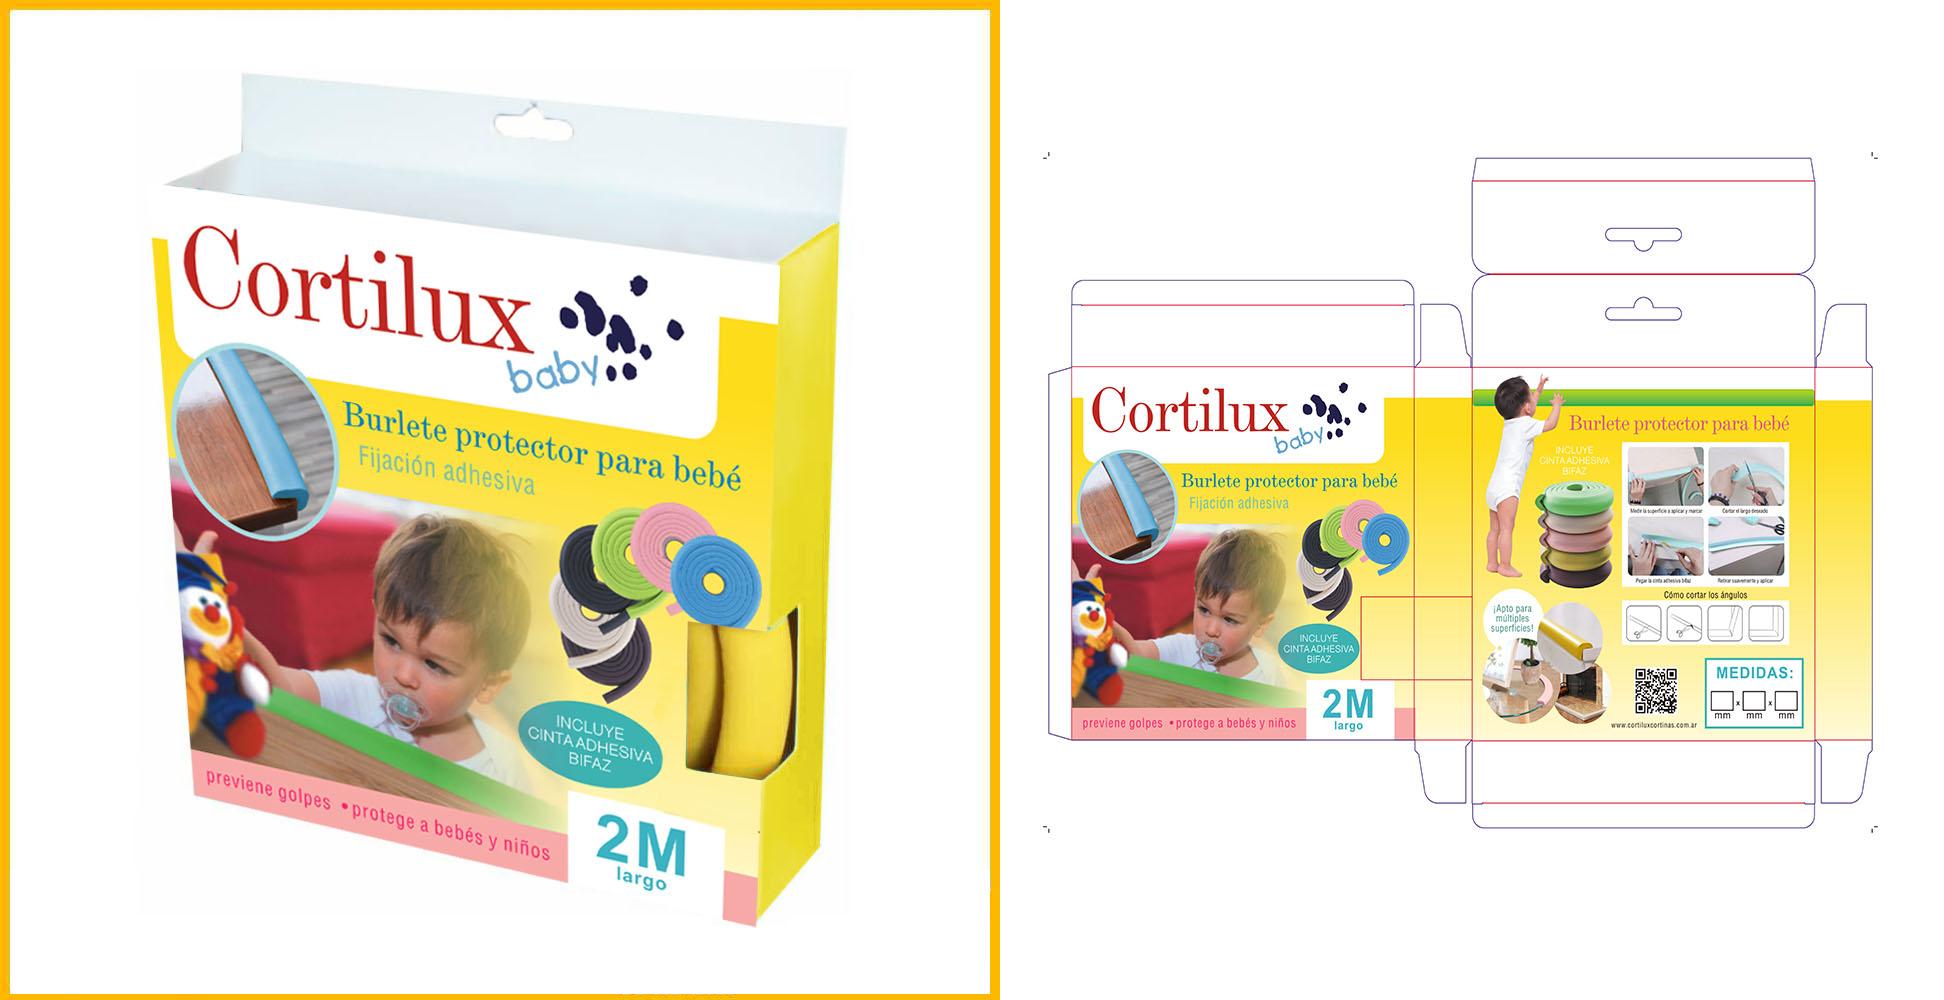 Cortilux Burlete